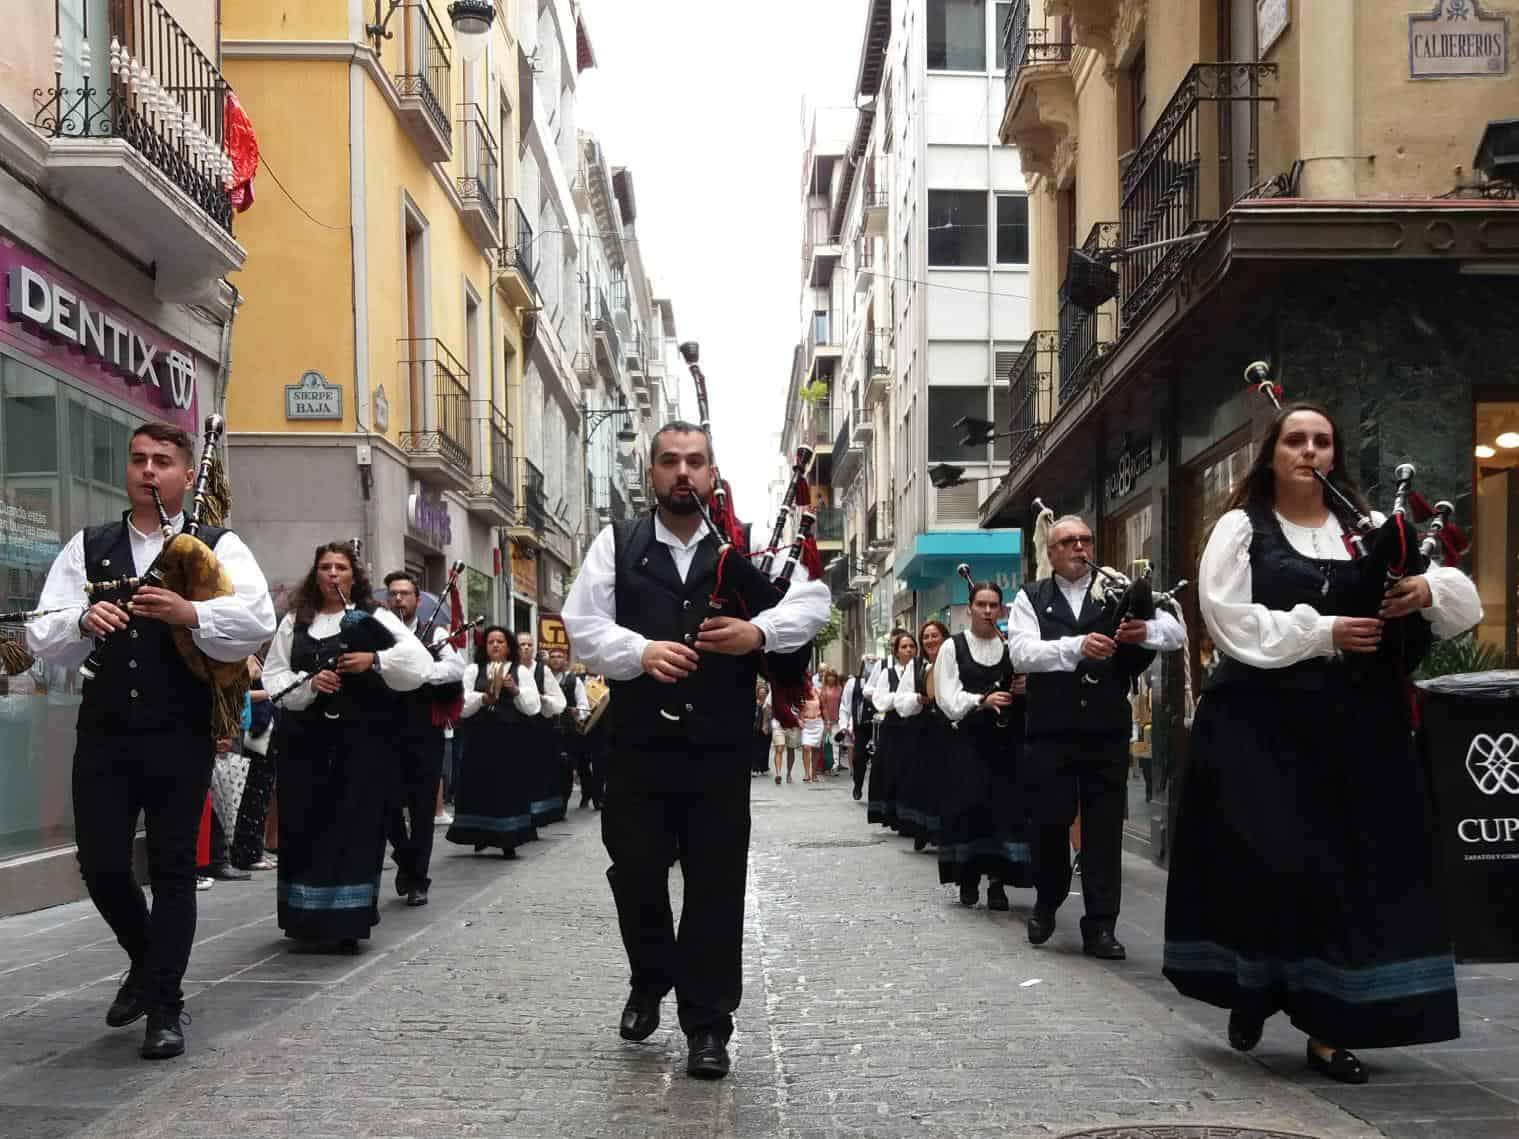 Banda de Gaitas Mazikandú en Granada